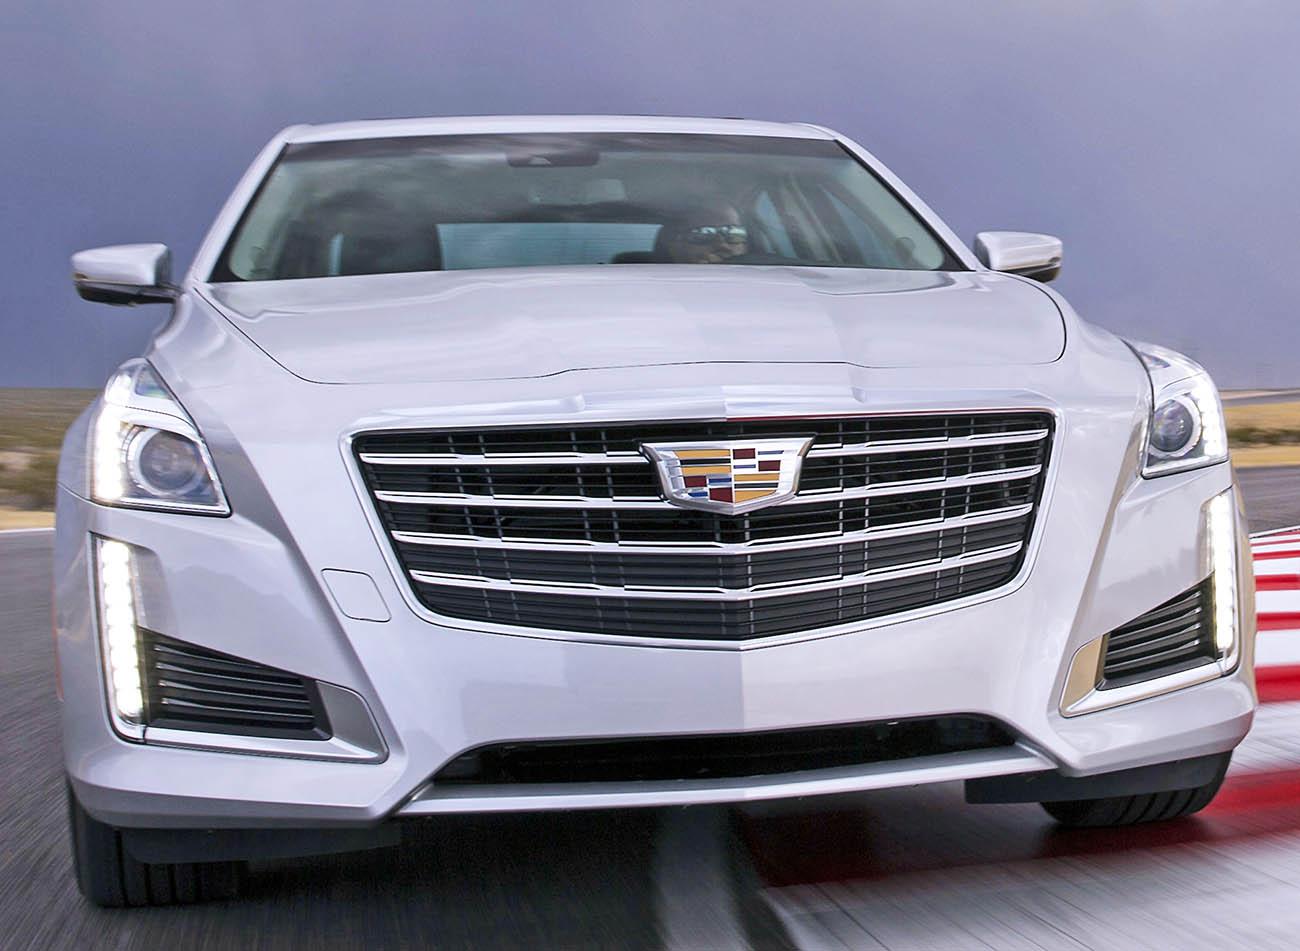 2017 Cadillac CTS luxury sedan